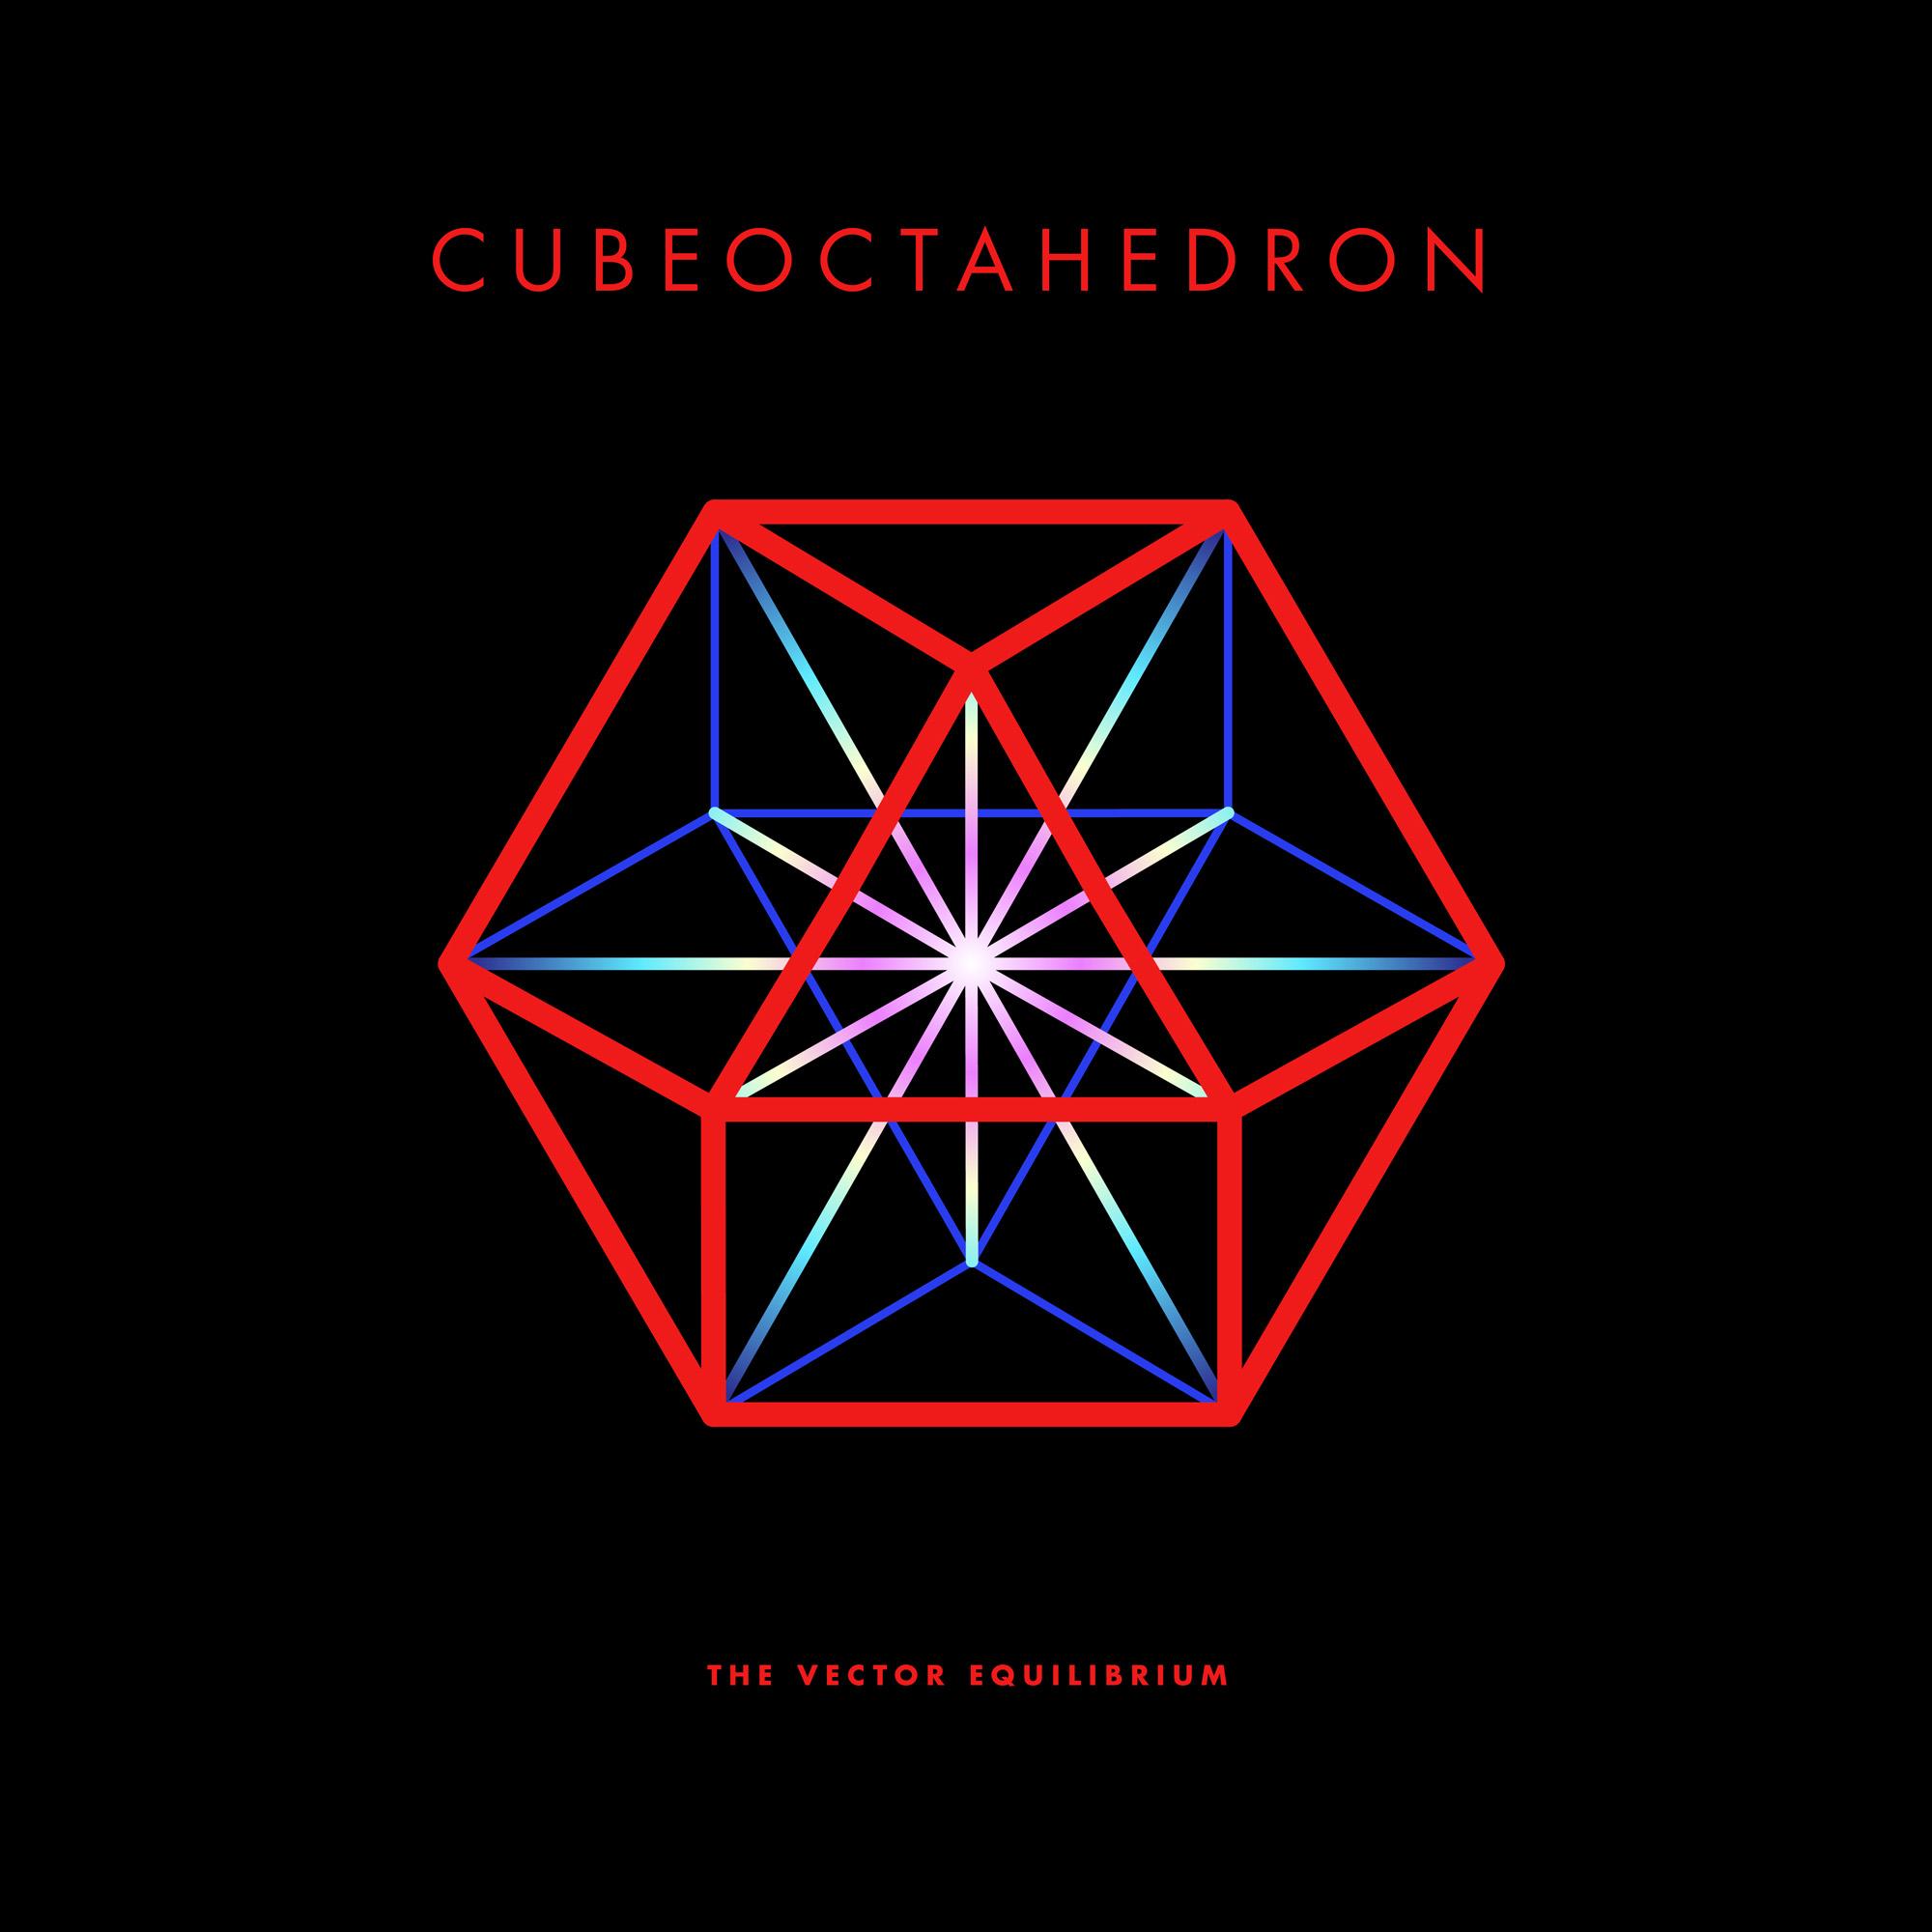 Cubeoctahedron